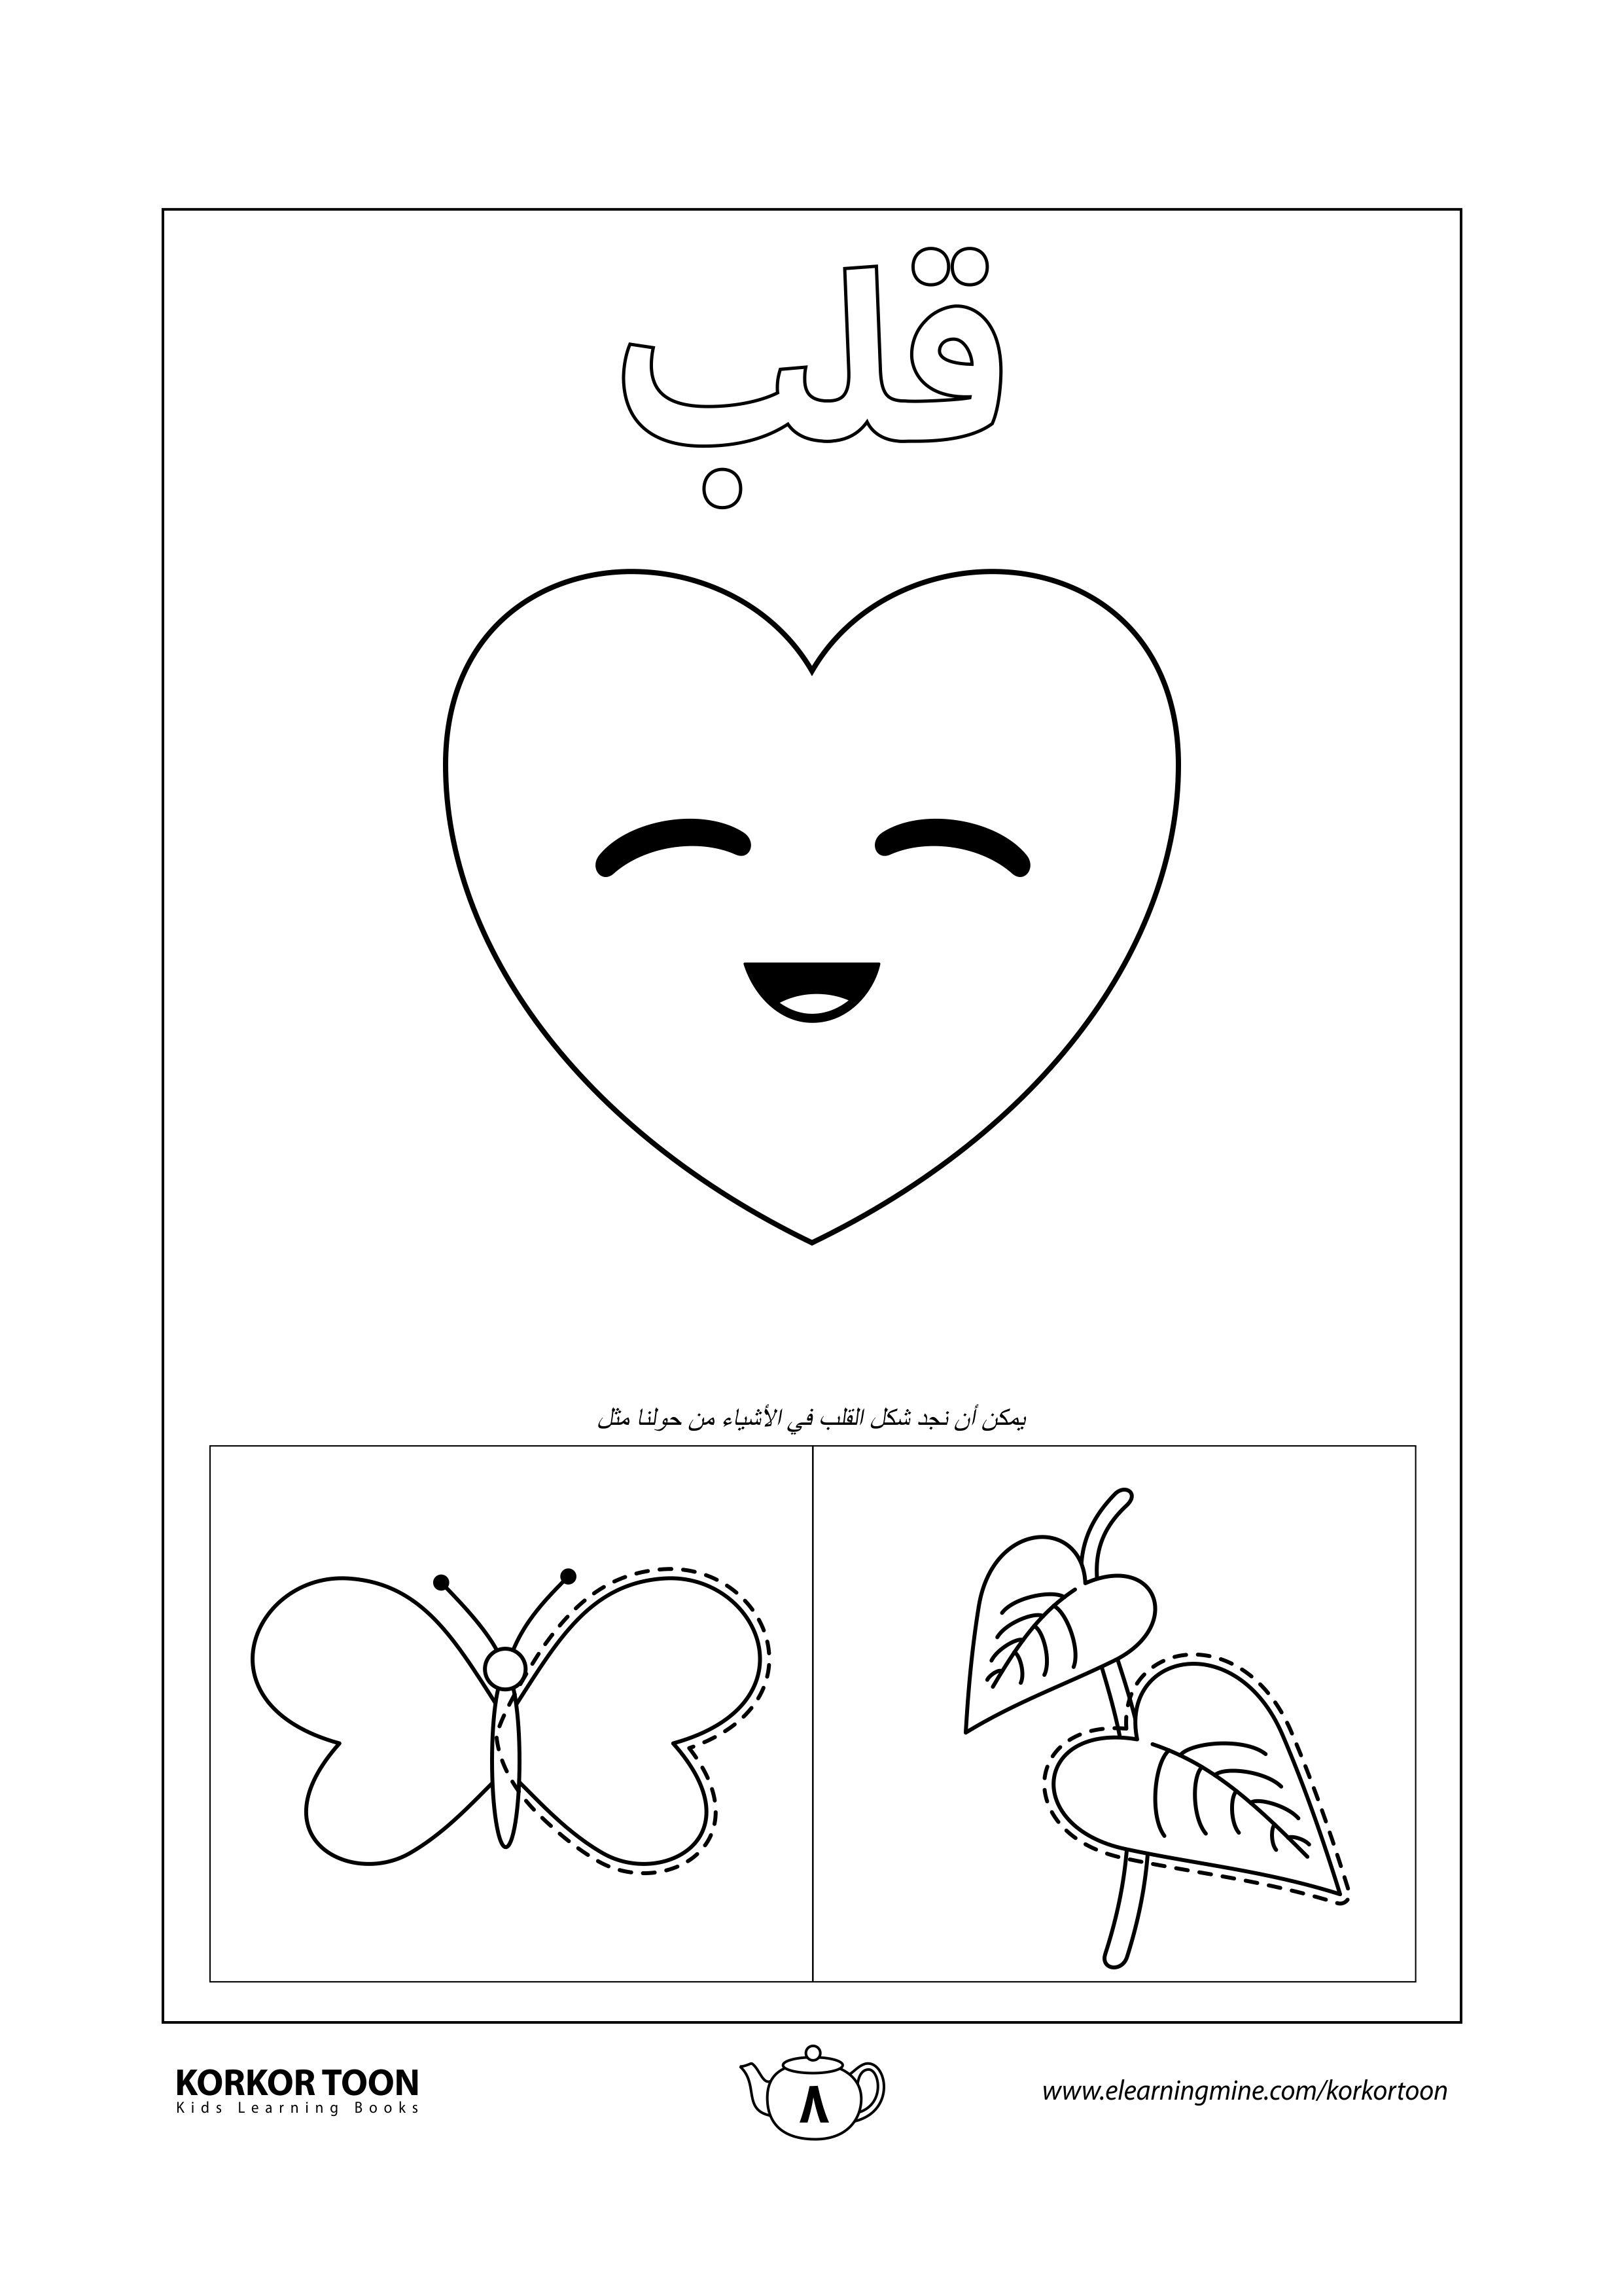 كتاب تلوين الأشكال الهندسية تلوين شكل القلب صفحة 8 Coloring Books Abc Coloring Pages Kids Coloring Books